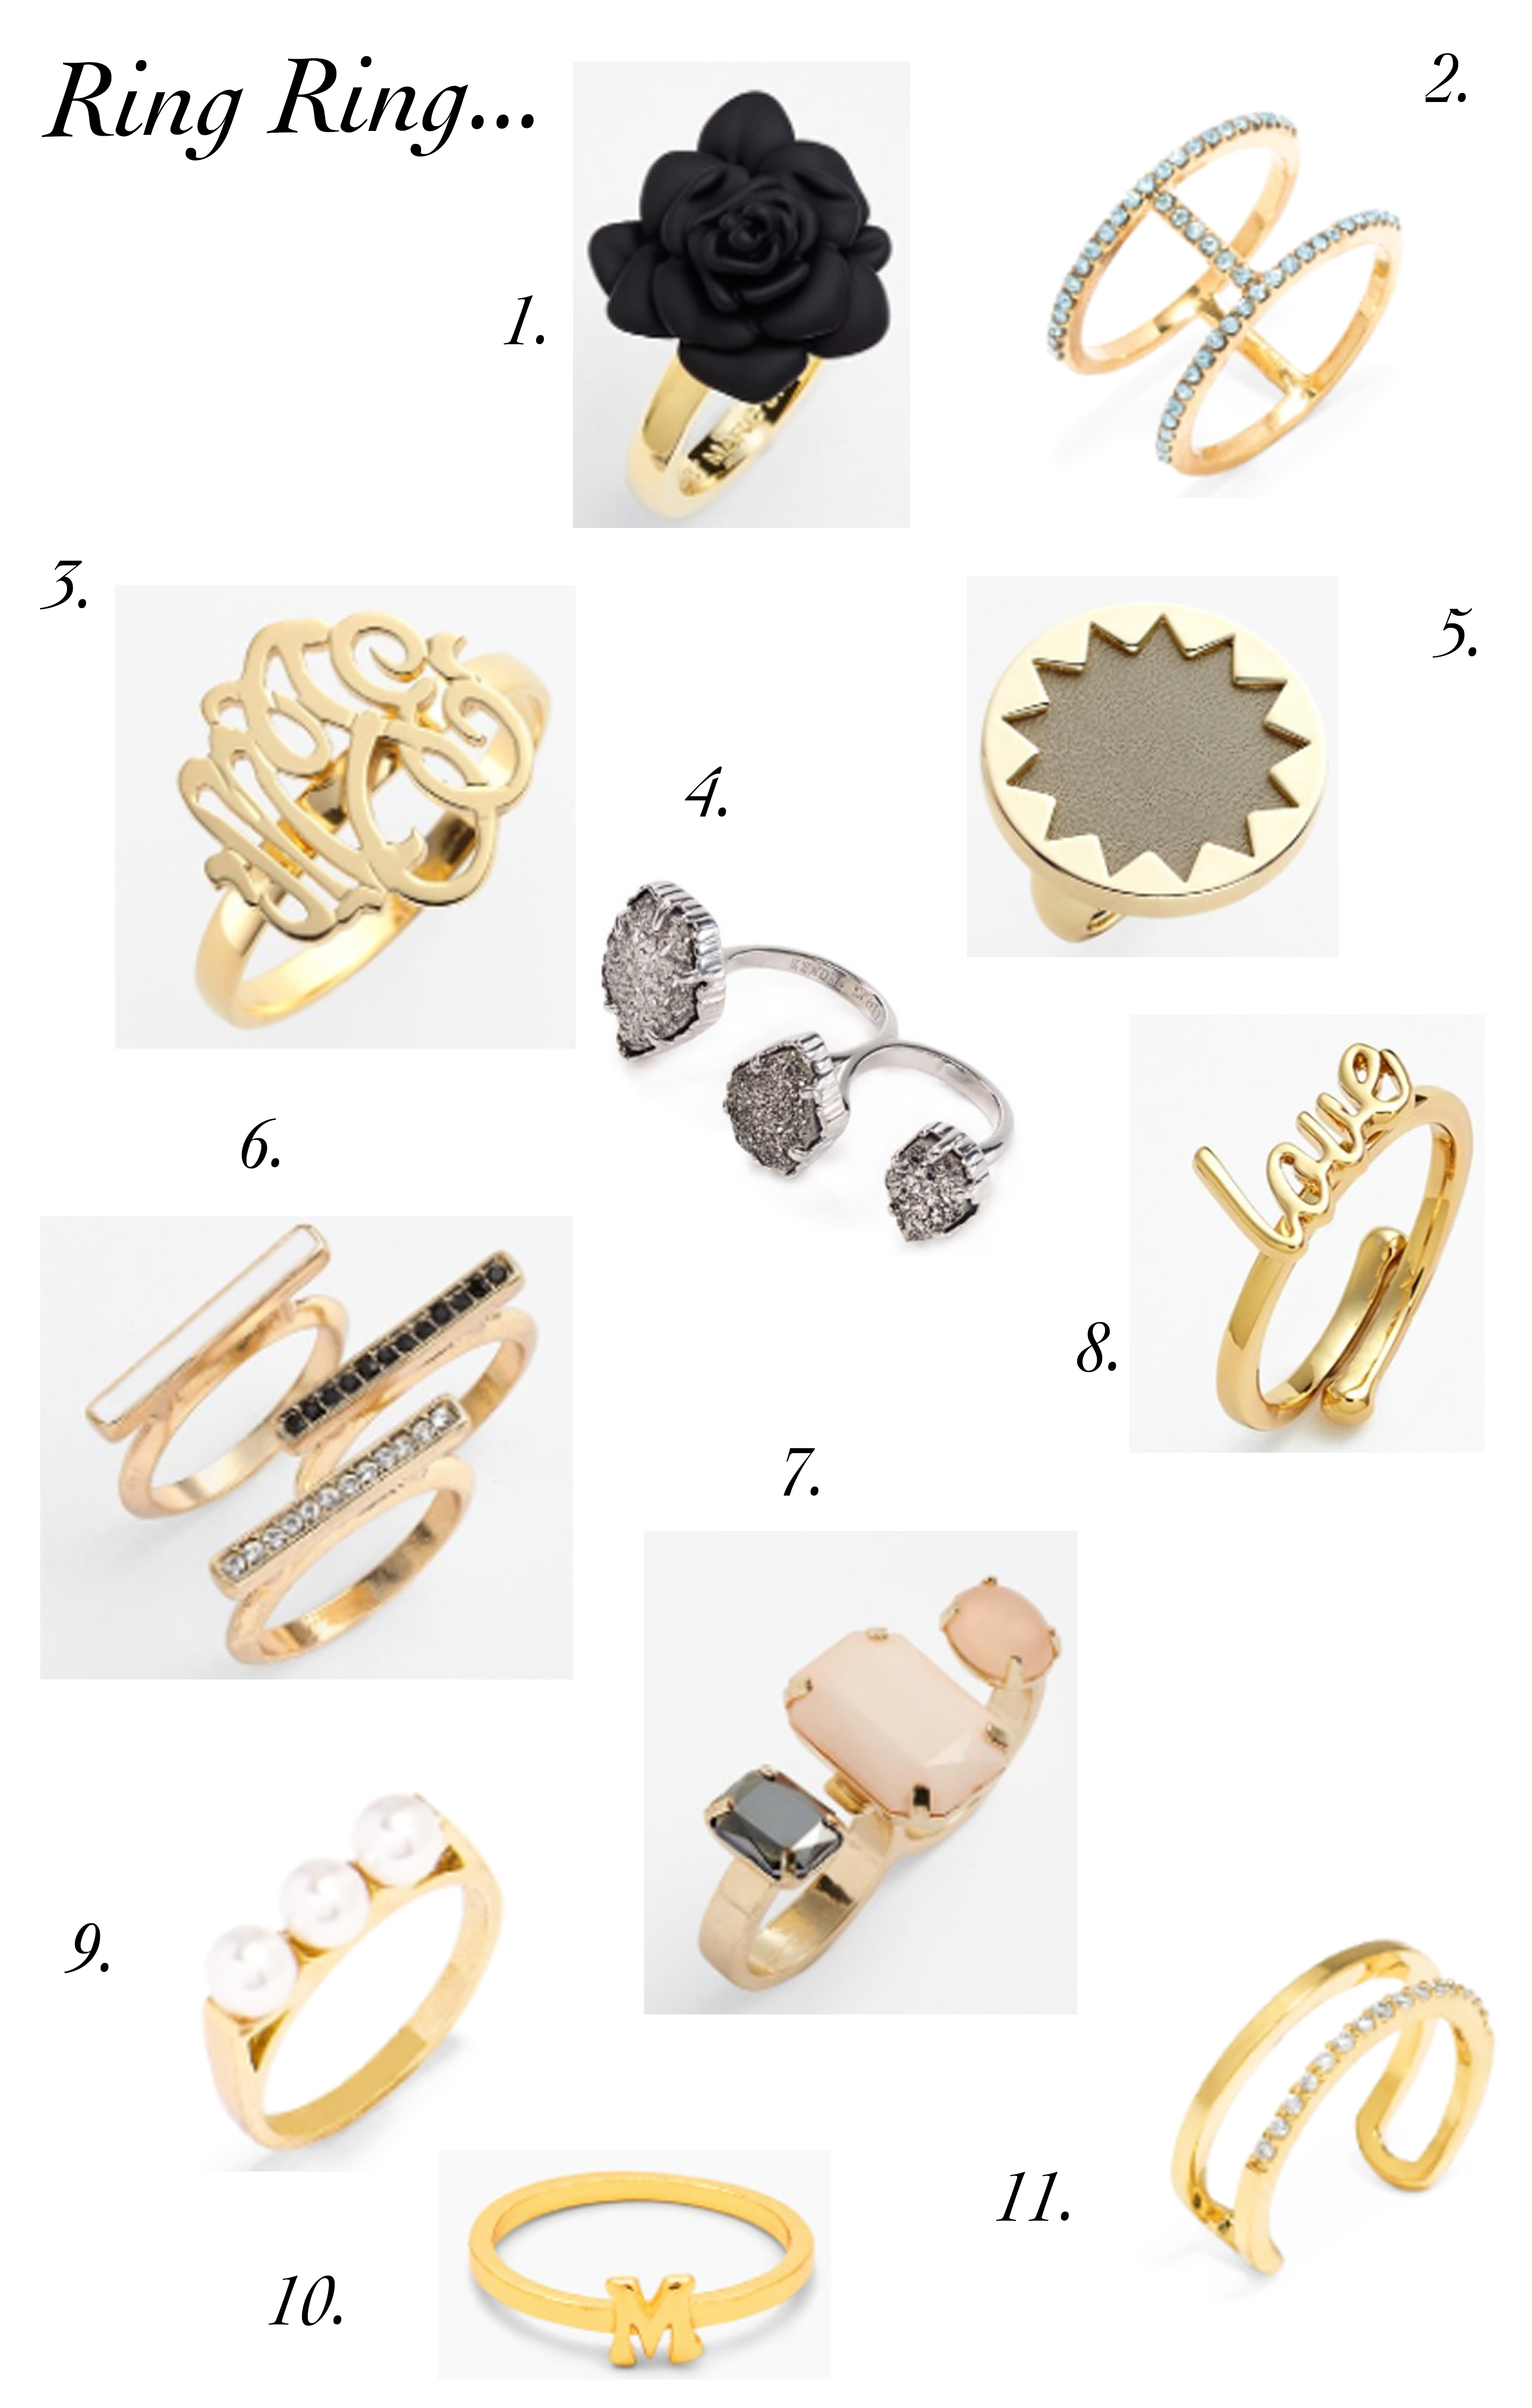 Fashion Rings + Midi Rings Under $150 // Kendra Scott Kate Spade Gorjana Nordstrom Monogram Ring